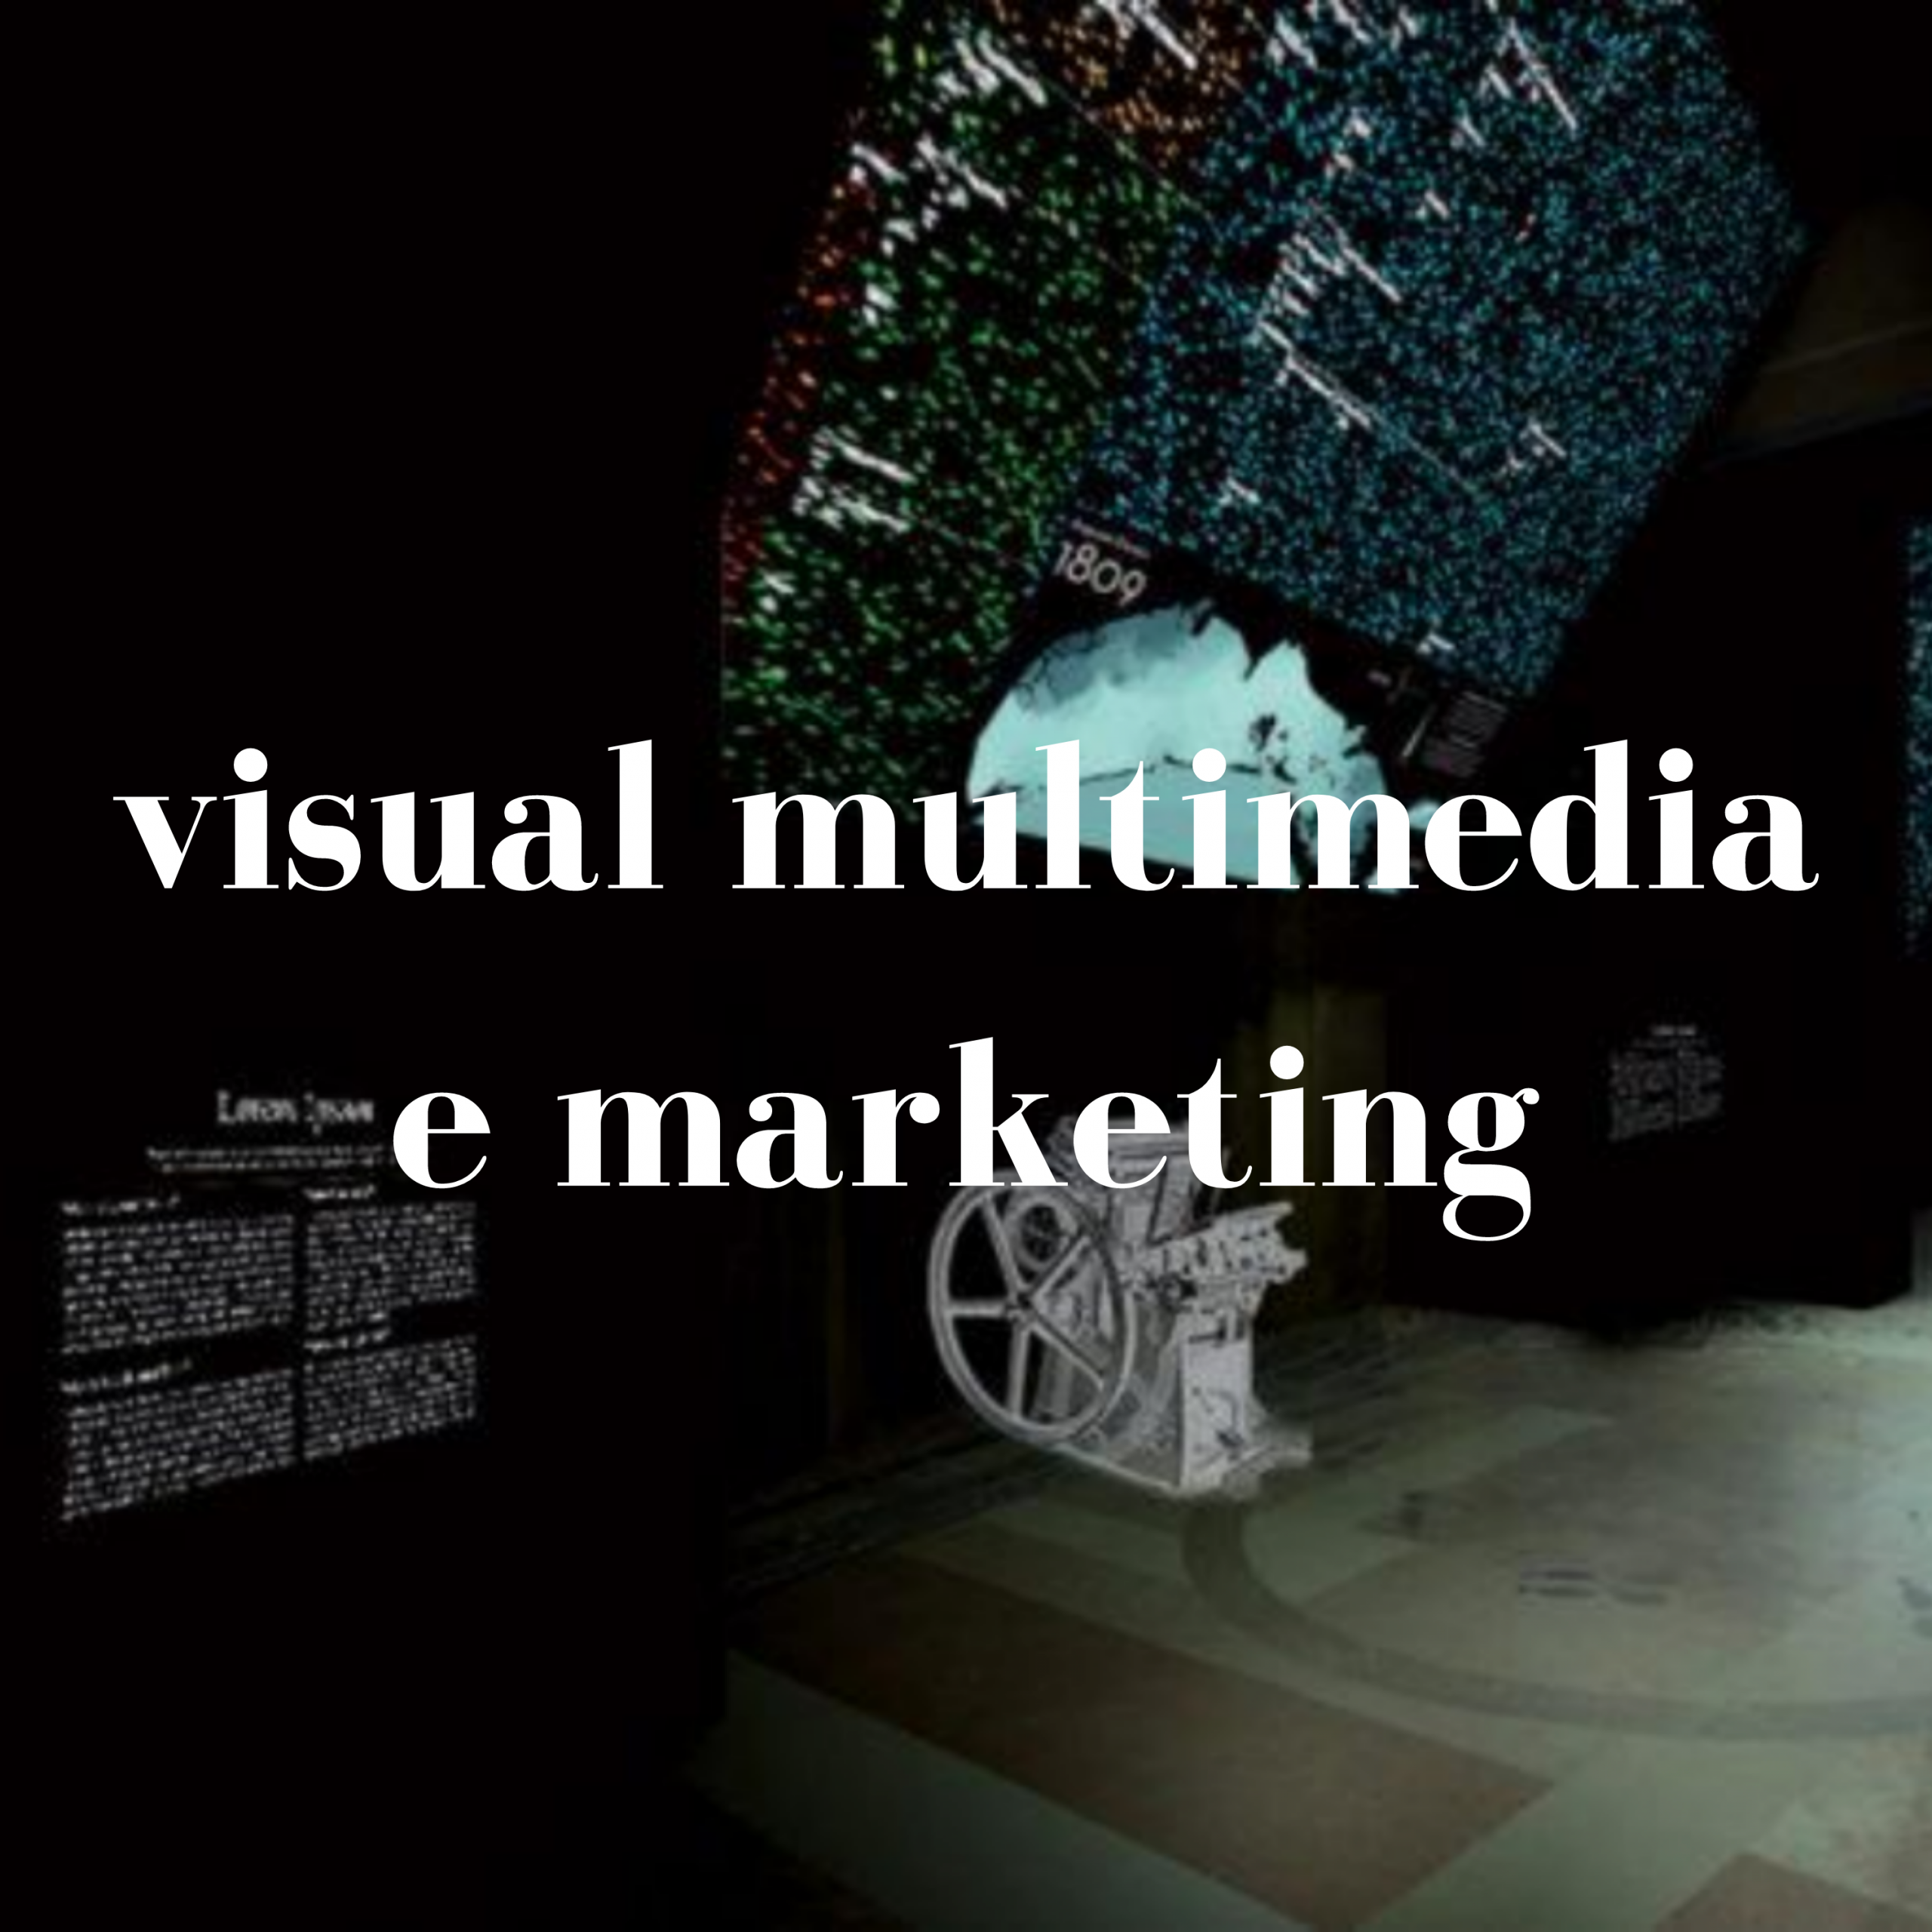 visual multimedia e marketing